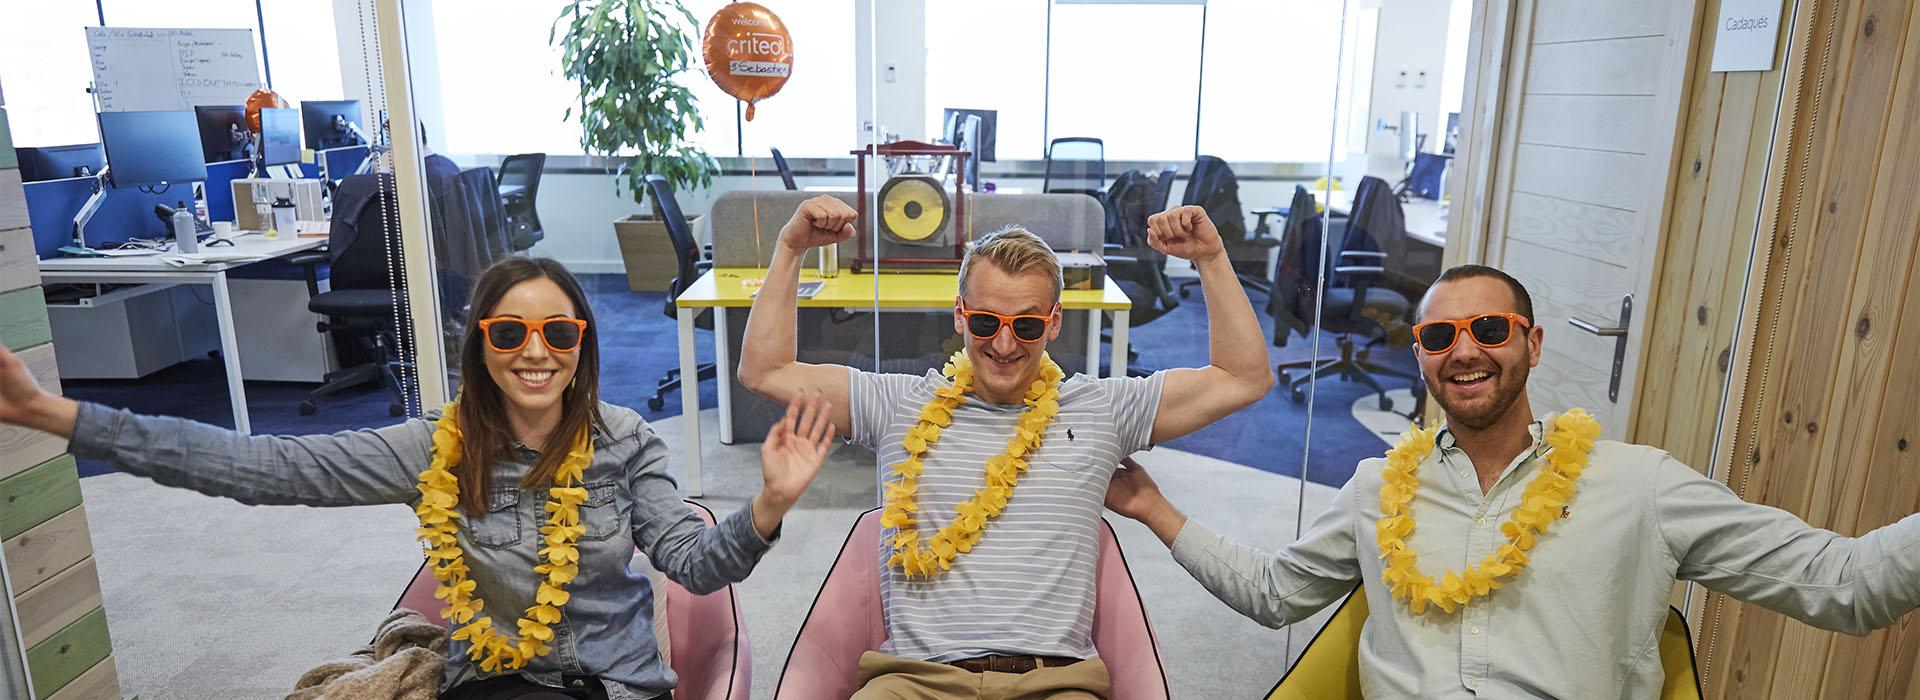 3 people in BCN office